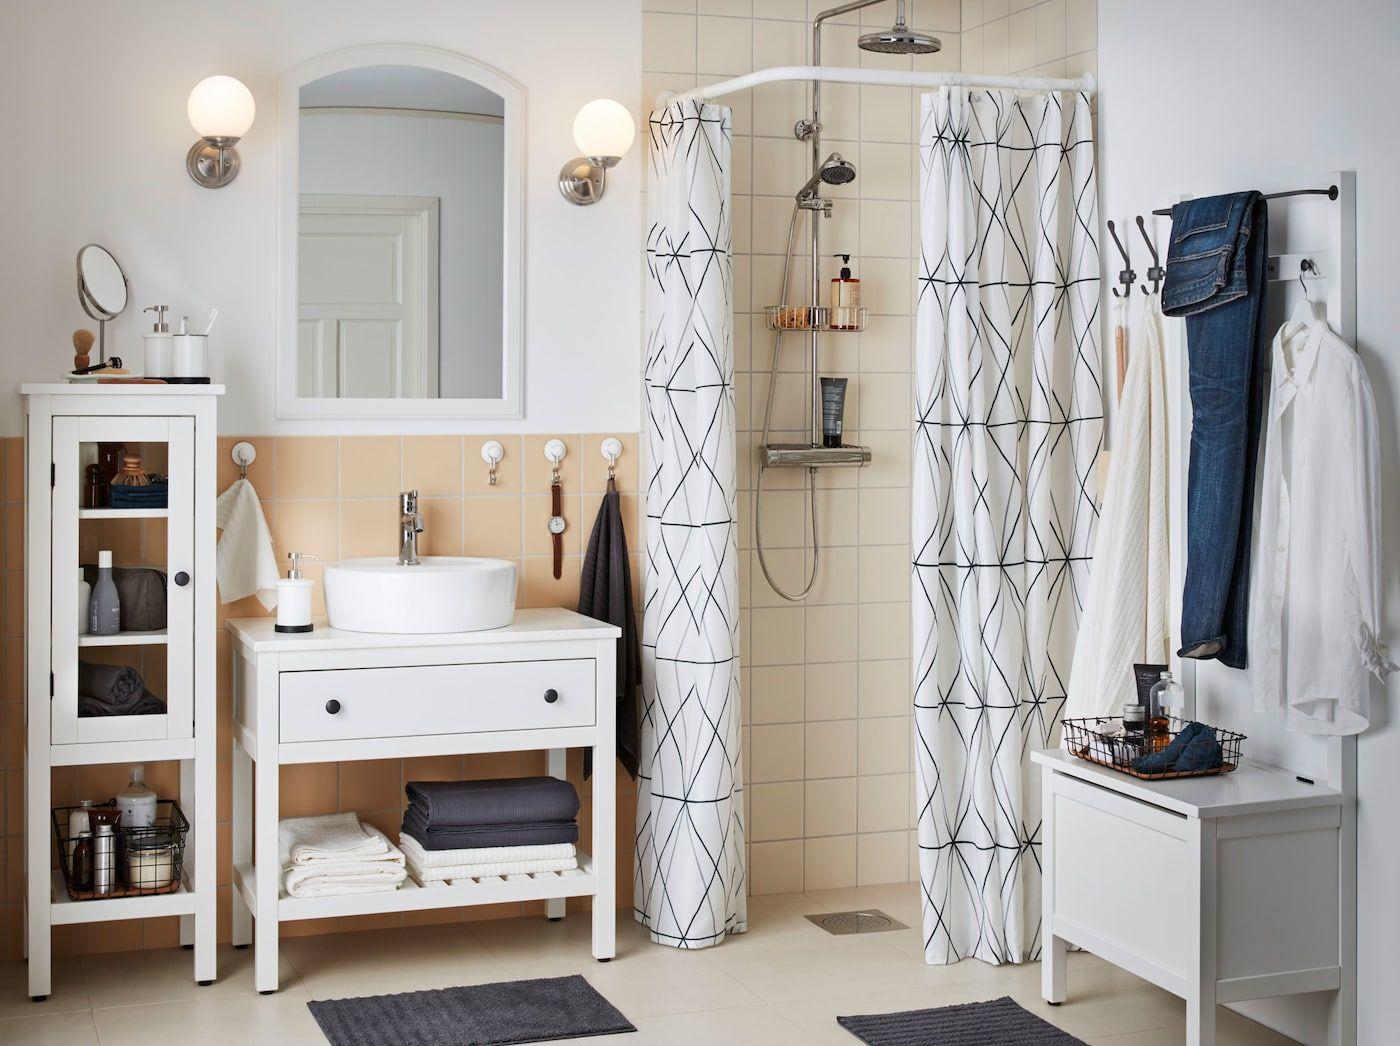 Traditionelle Badezimmer Inspiration Ikea Badezimmer Bad Inspiration Badezimmer